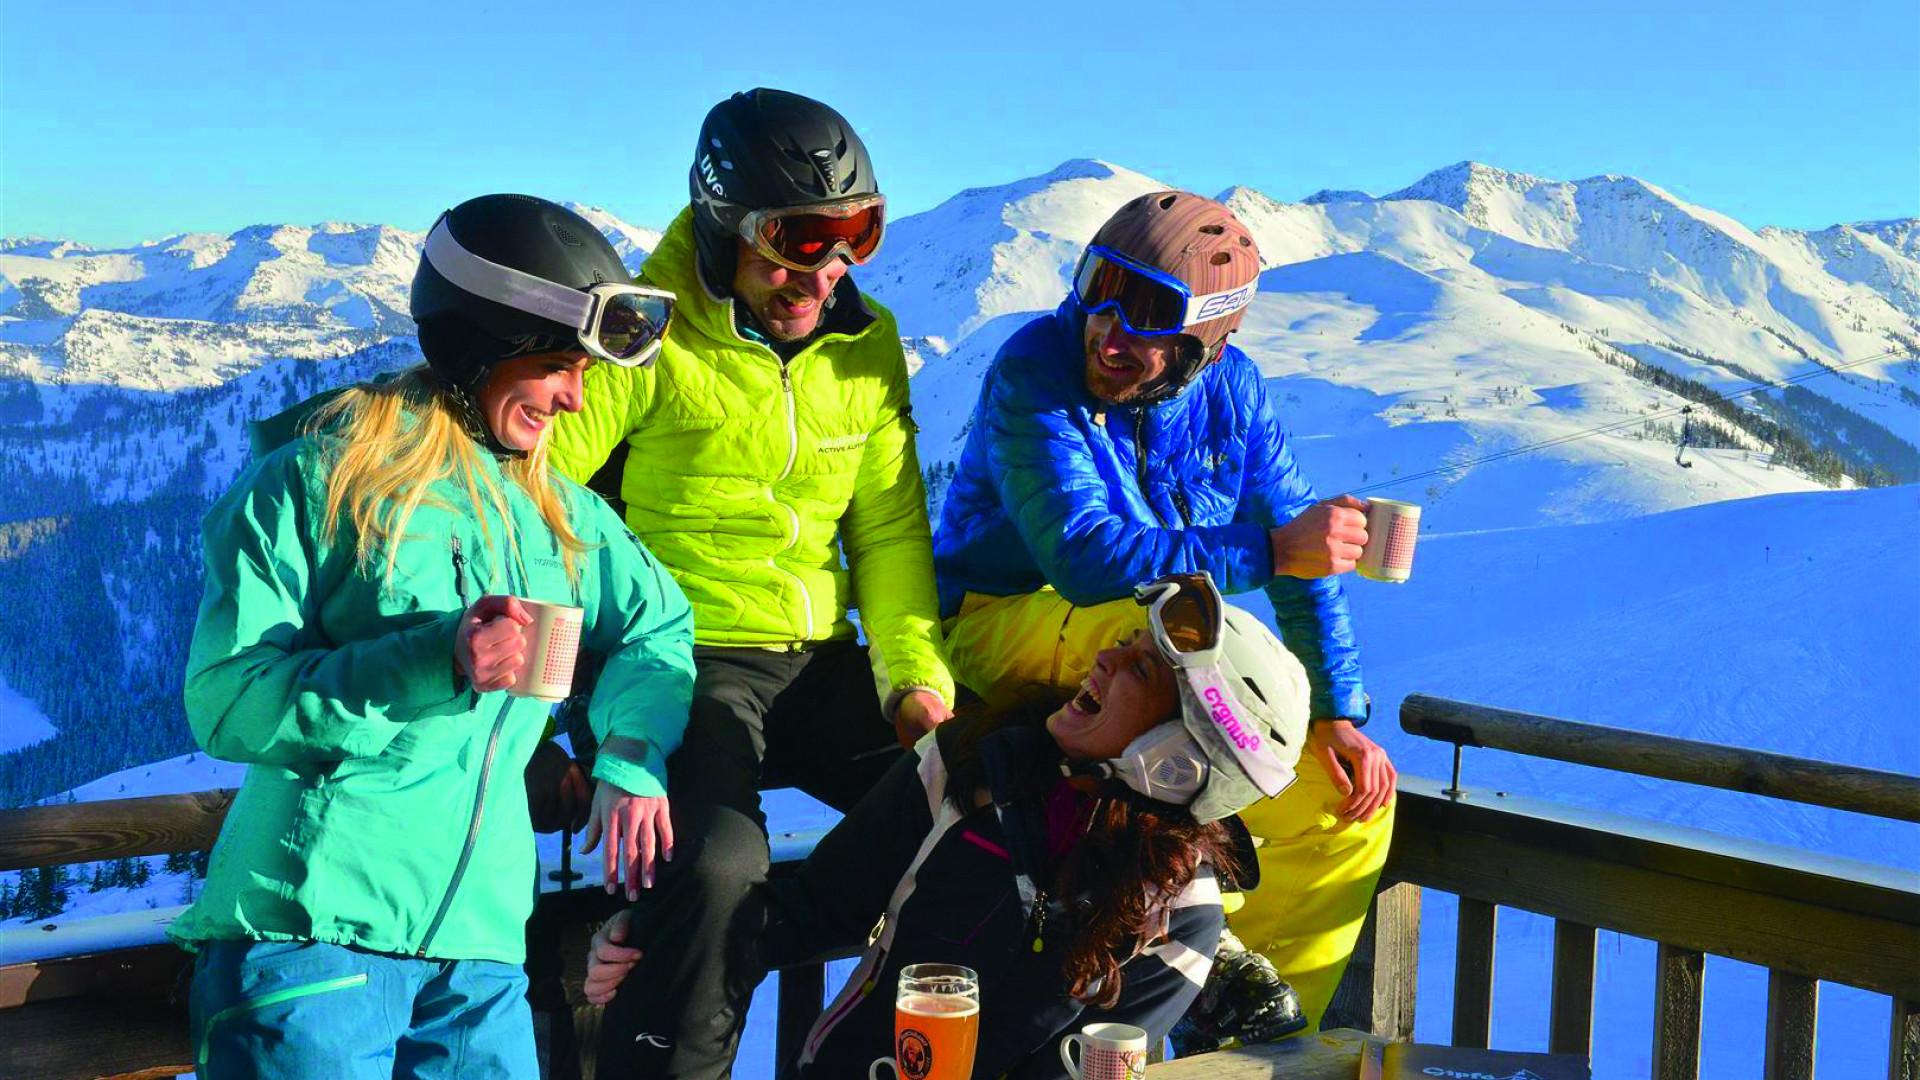 People enjoying an alpine bar in Austria